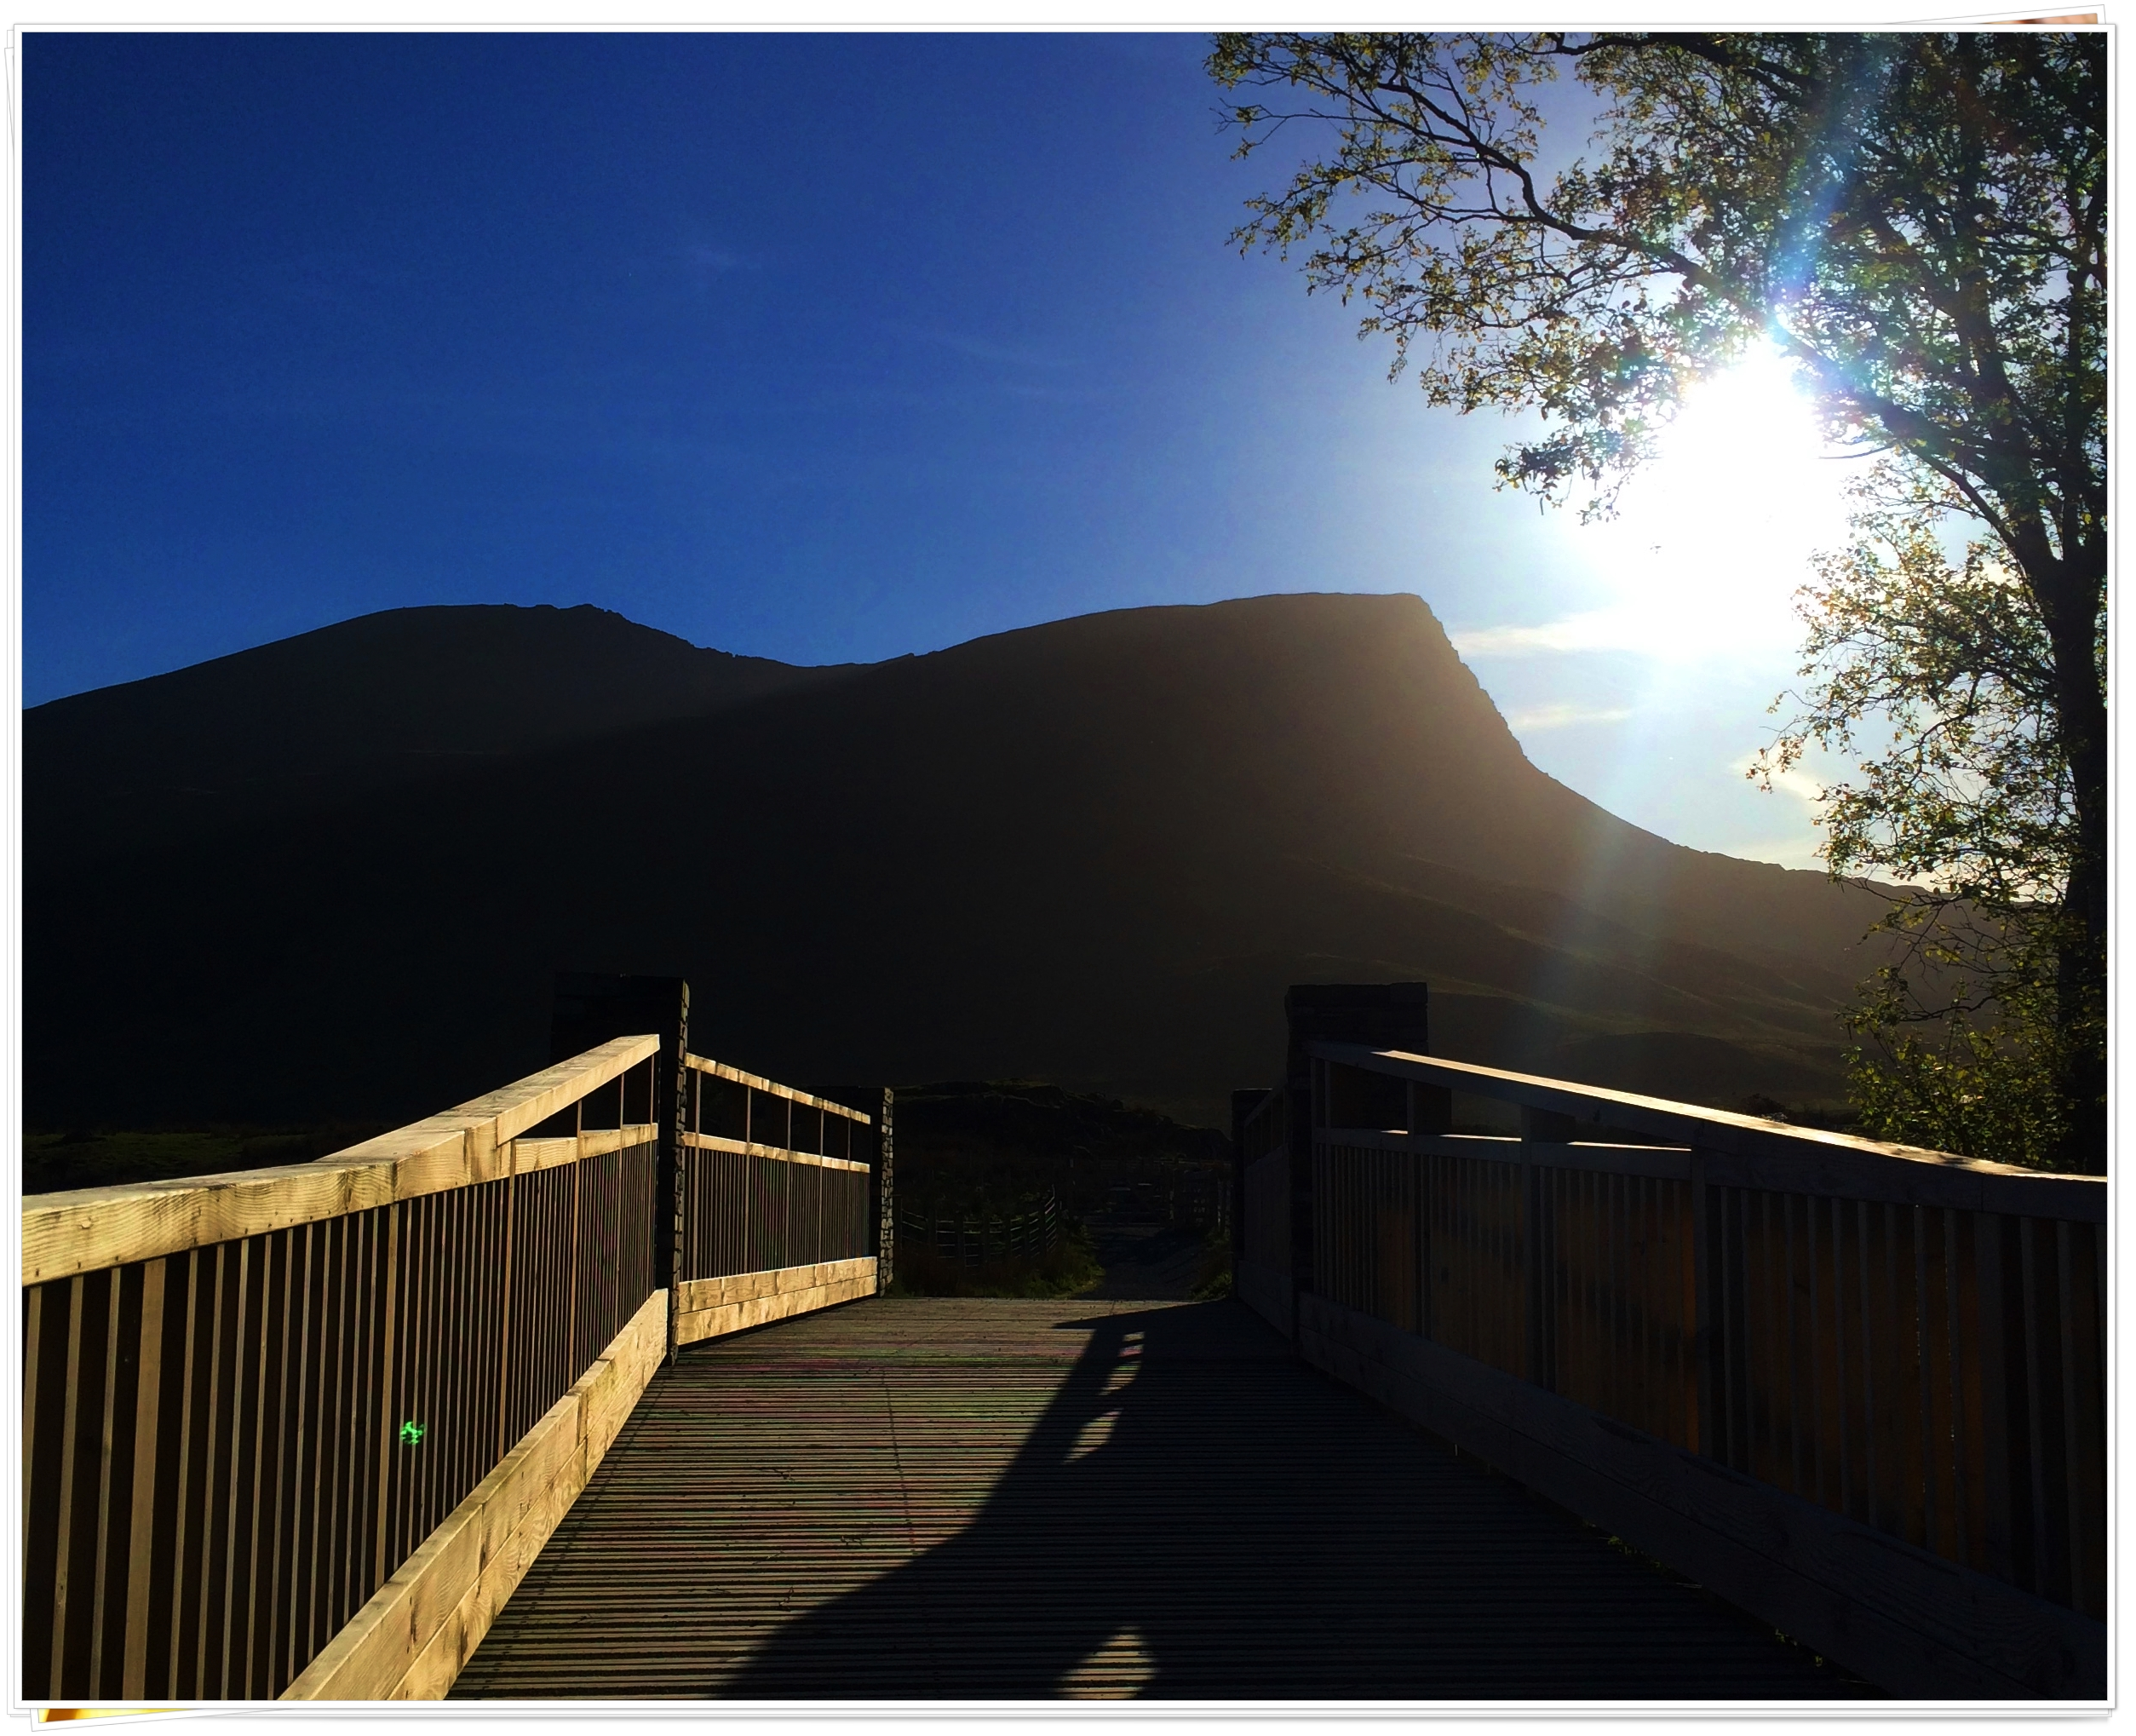 Snowdonia, Wales - 2015